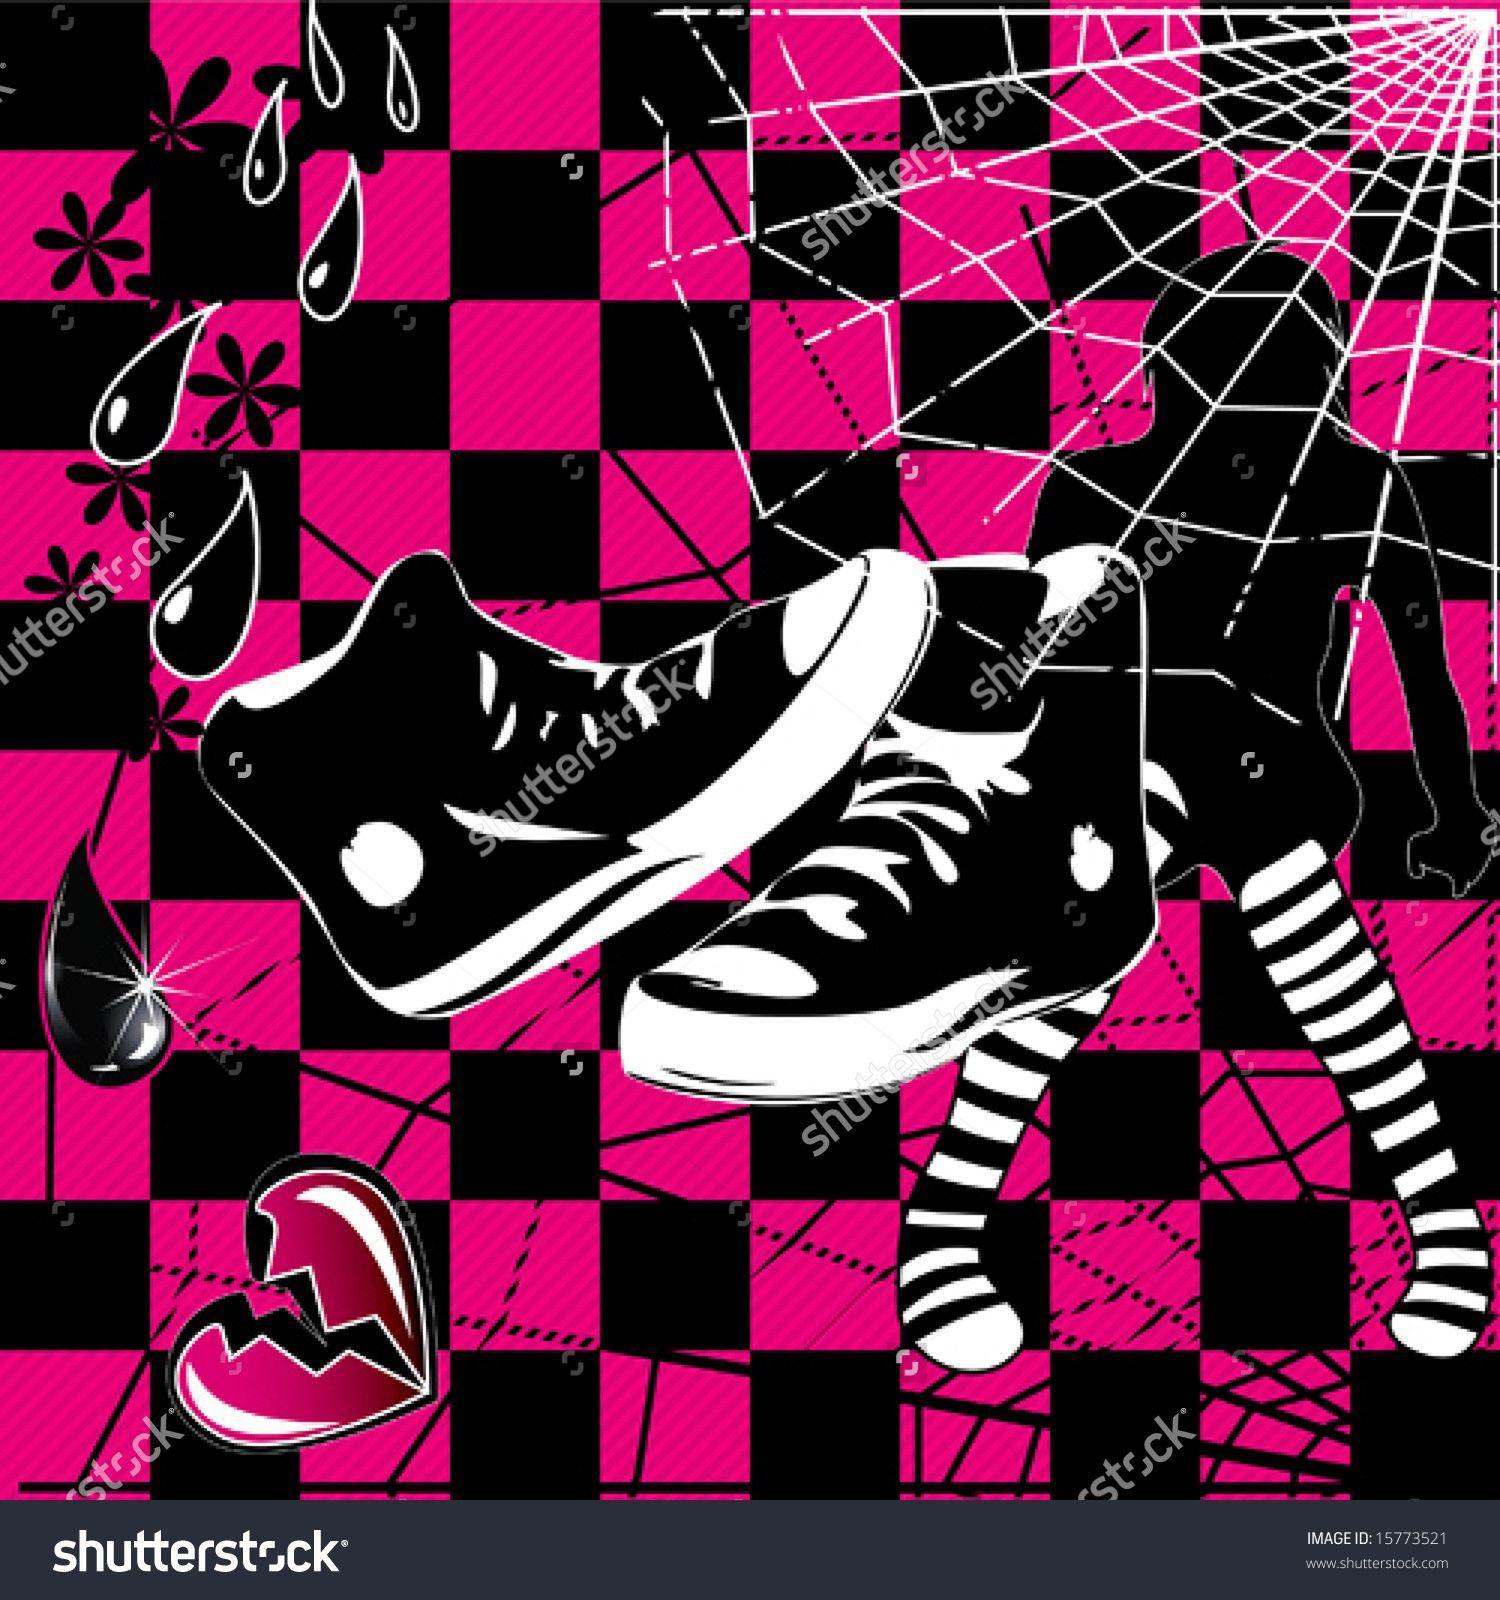 Emo Background Images Wallpaper Cave